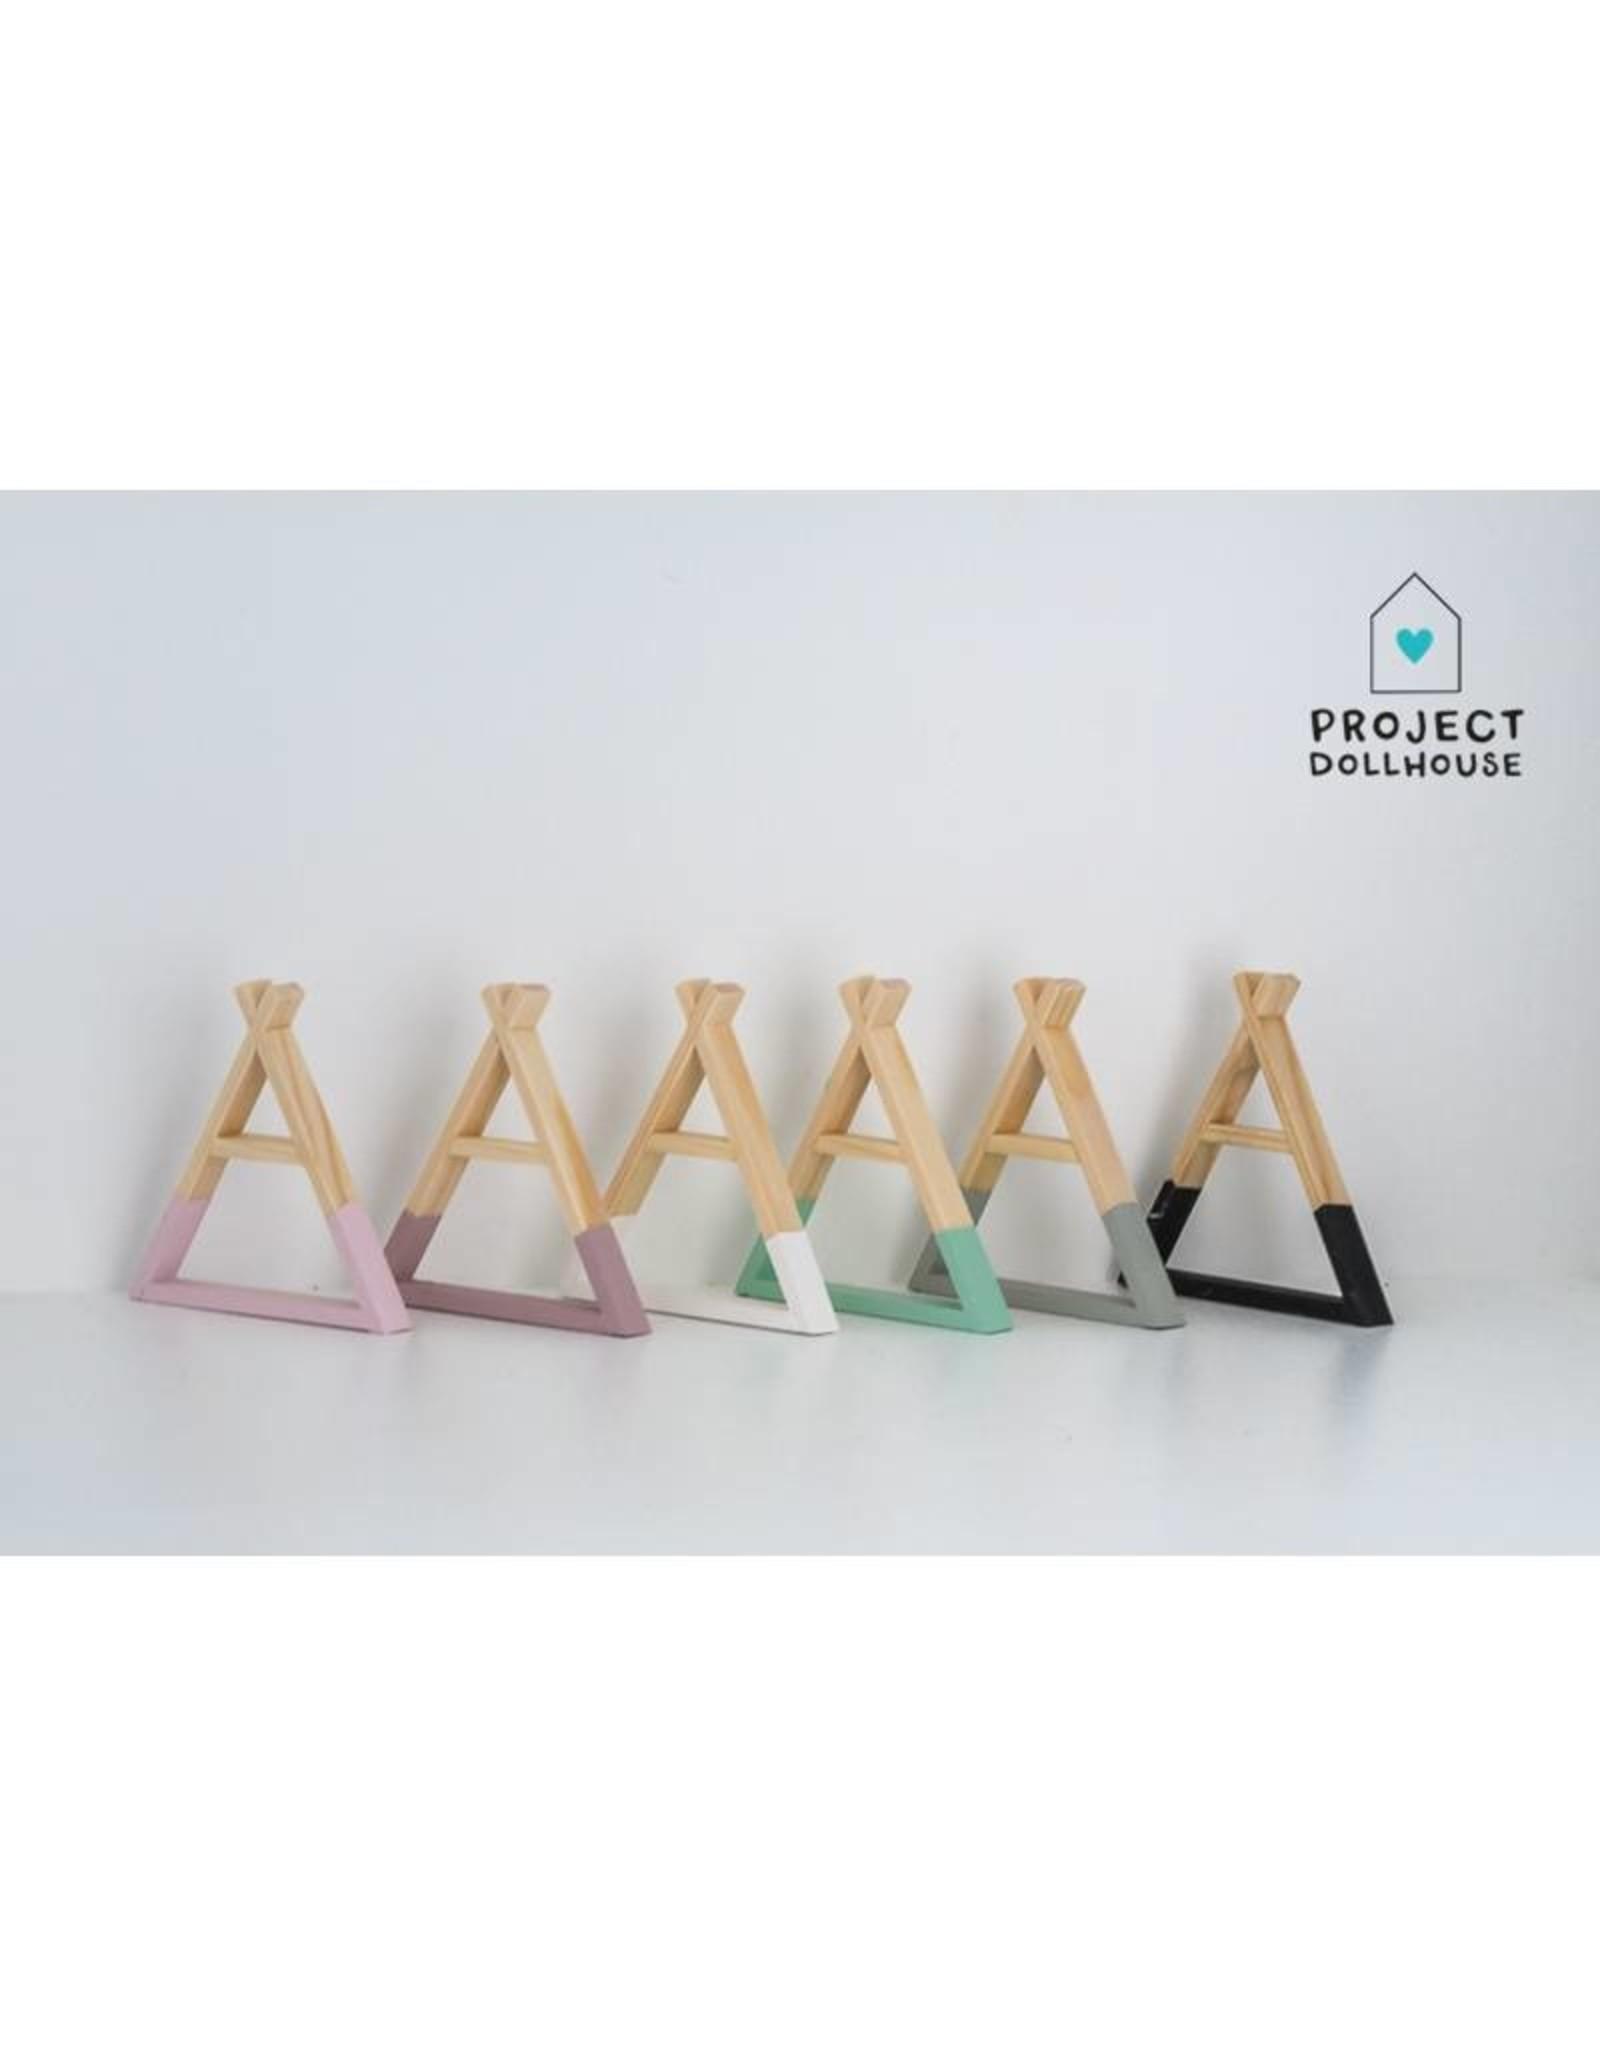 Project Dollhouse Tipi Wall Rack